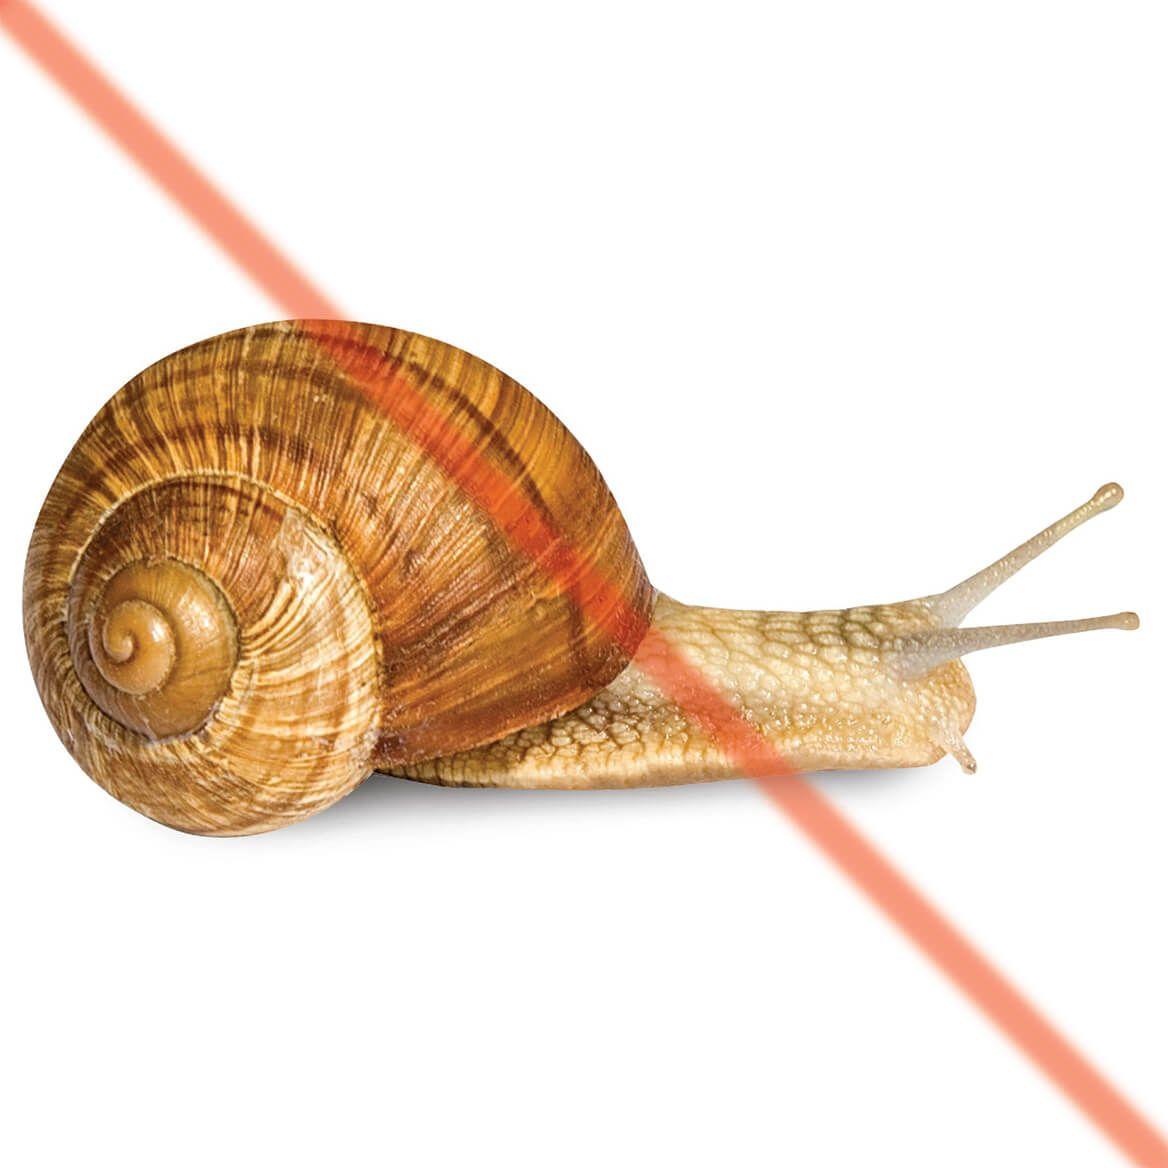 Copper Slug and Snail Repellent Tape Set of 2-348167